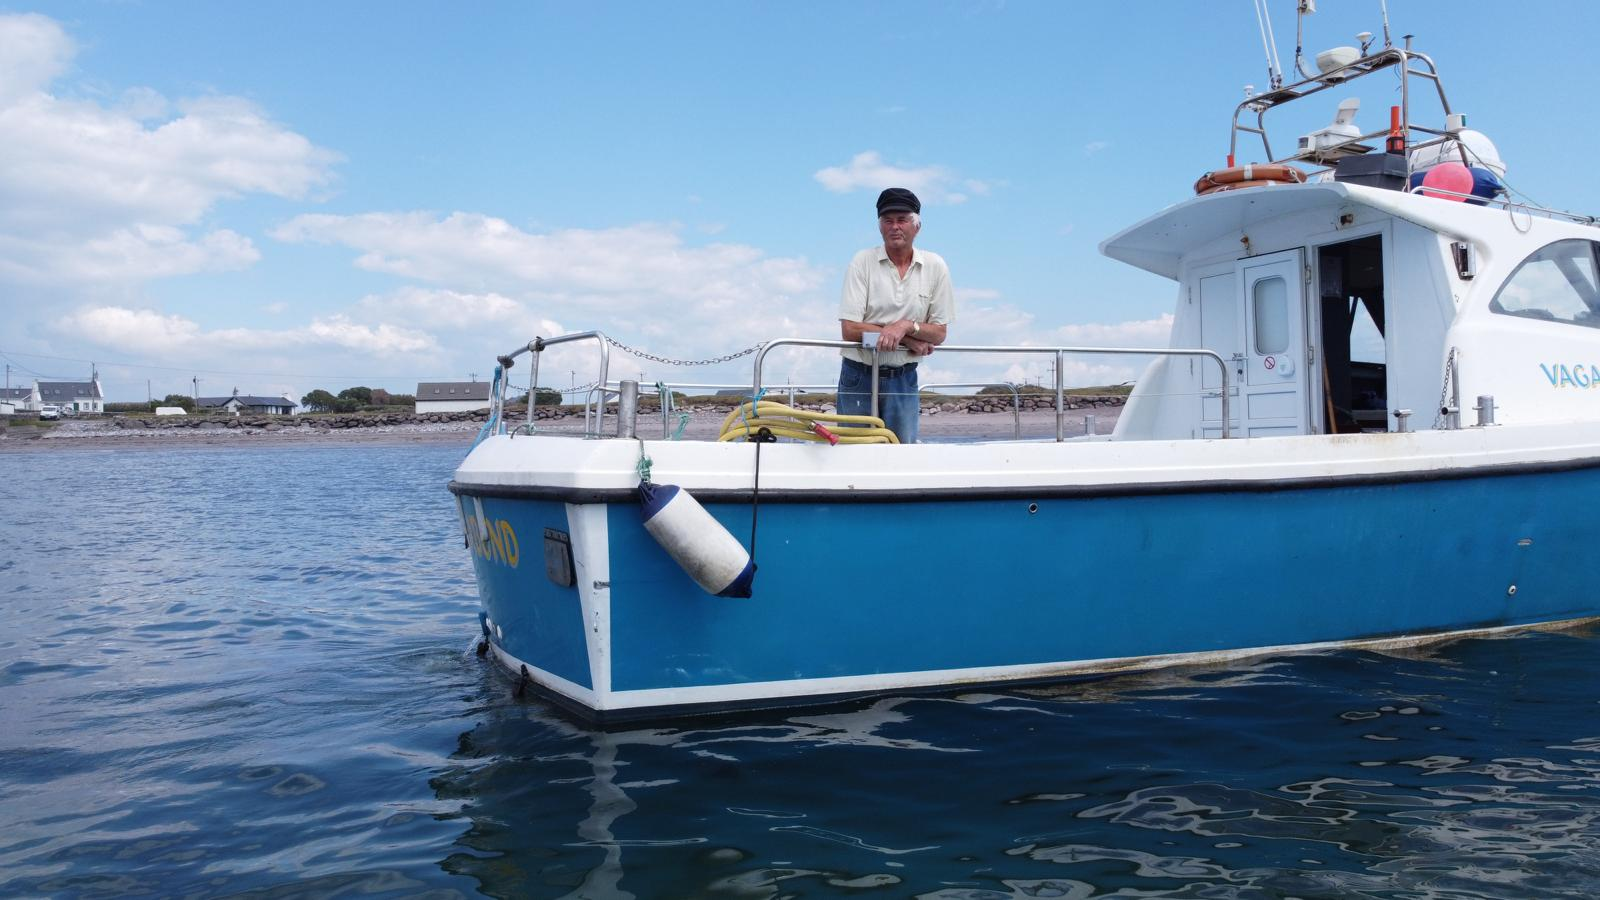 Pat Browne aboard boat